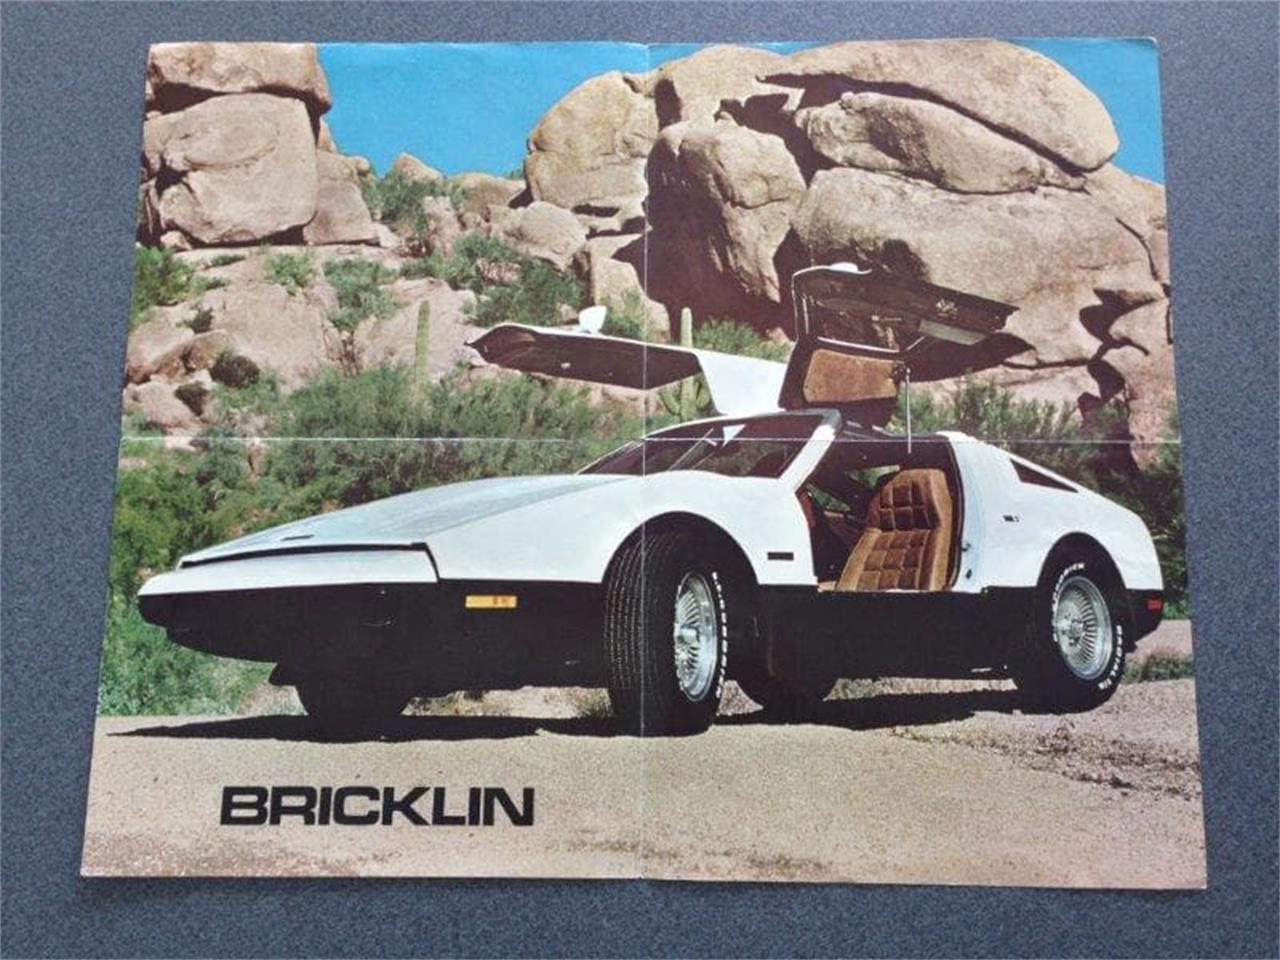 Large Picture of '75 Bricklin SV 1 located in Virginia - $26,700.00 - JLA1